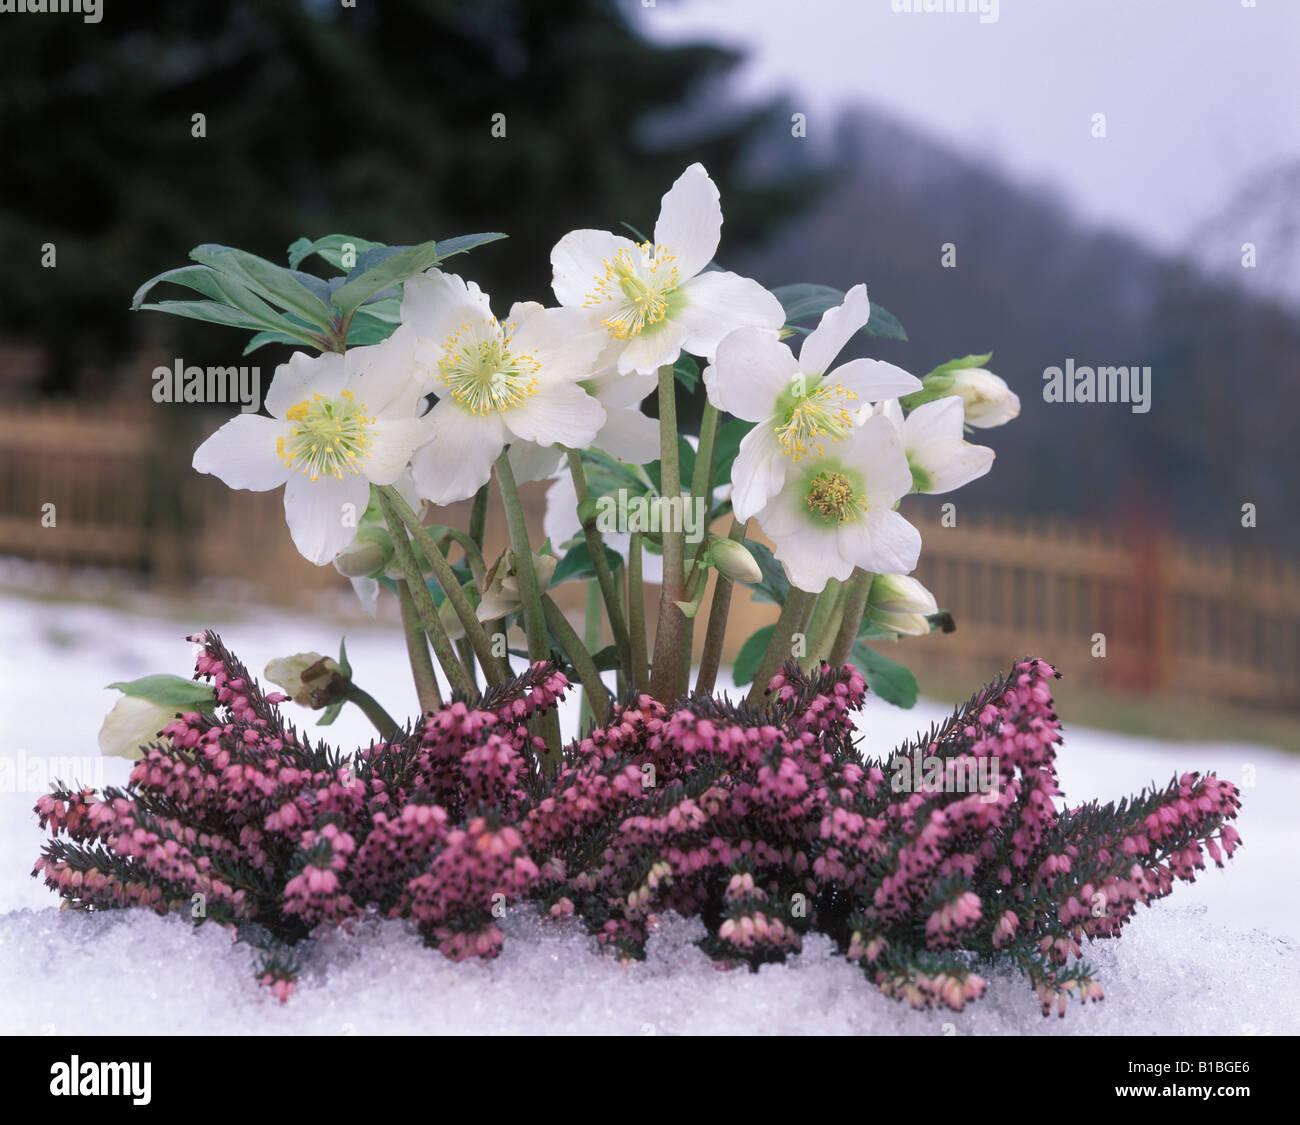 flower christrose erika christmas rose stock photo royalty free image 18079438 alamy. Black Bedroom Furniture Sets. Home Design Ideas